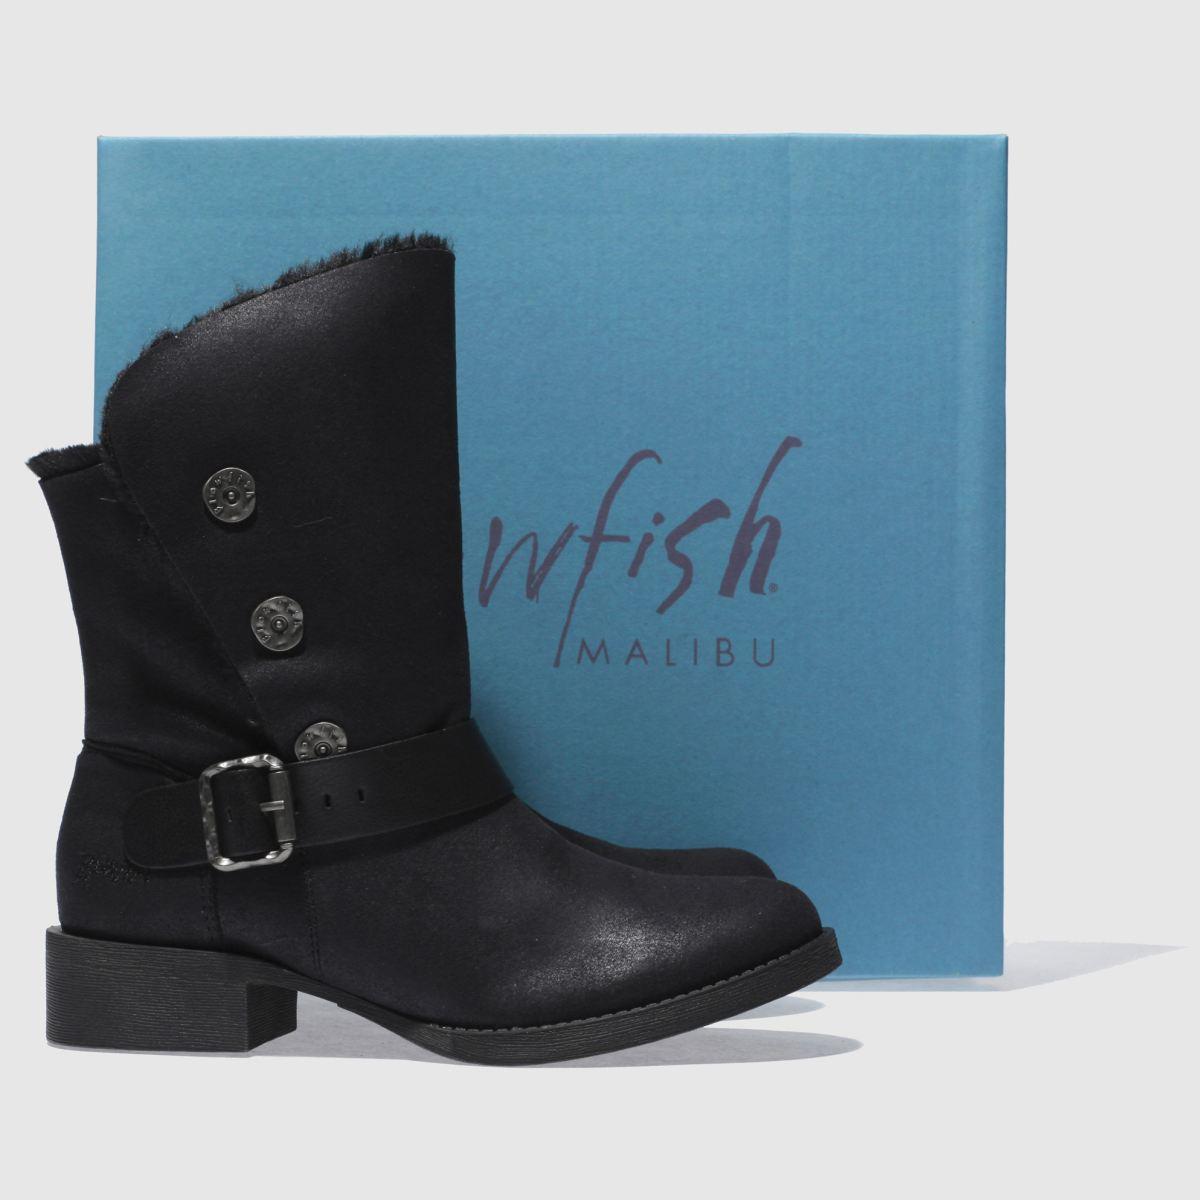 Damen Schwarz blowfish schuh Katti Shearling Boots | schuh blowfish Gute Qualität beliebte Schuhe cdcd51